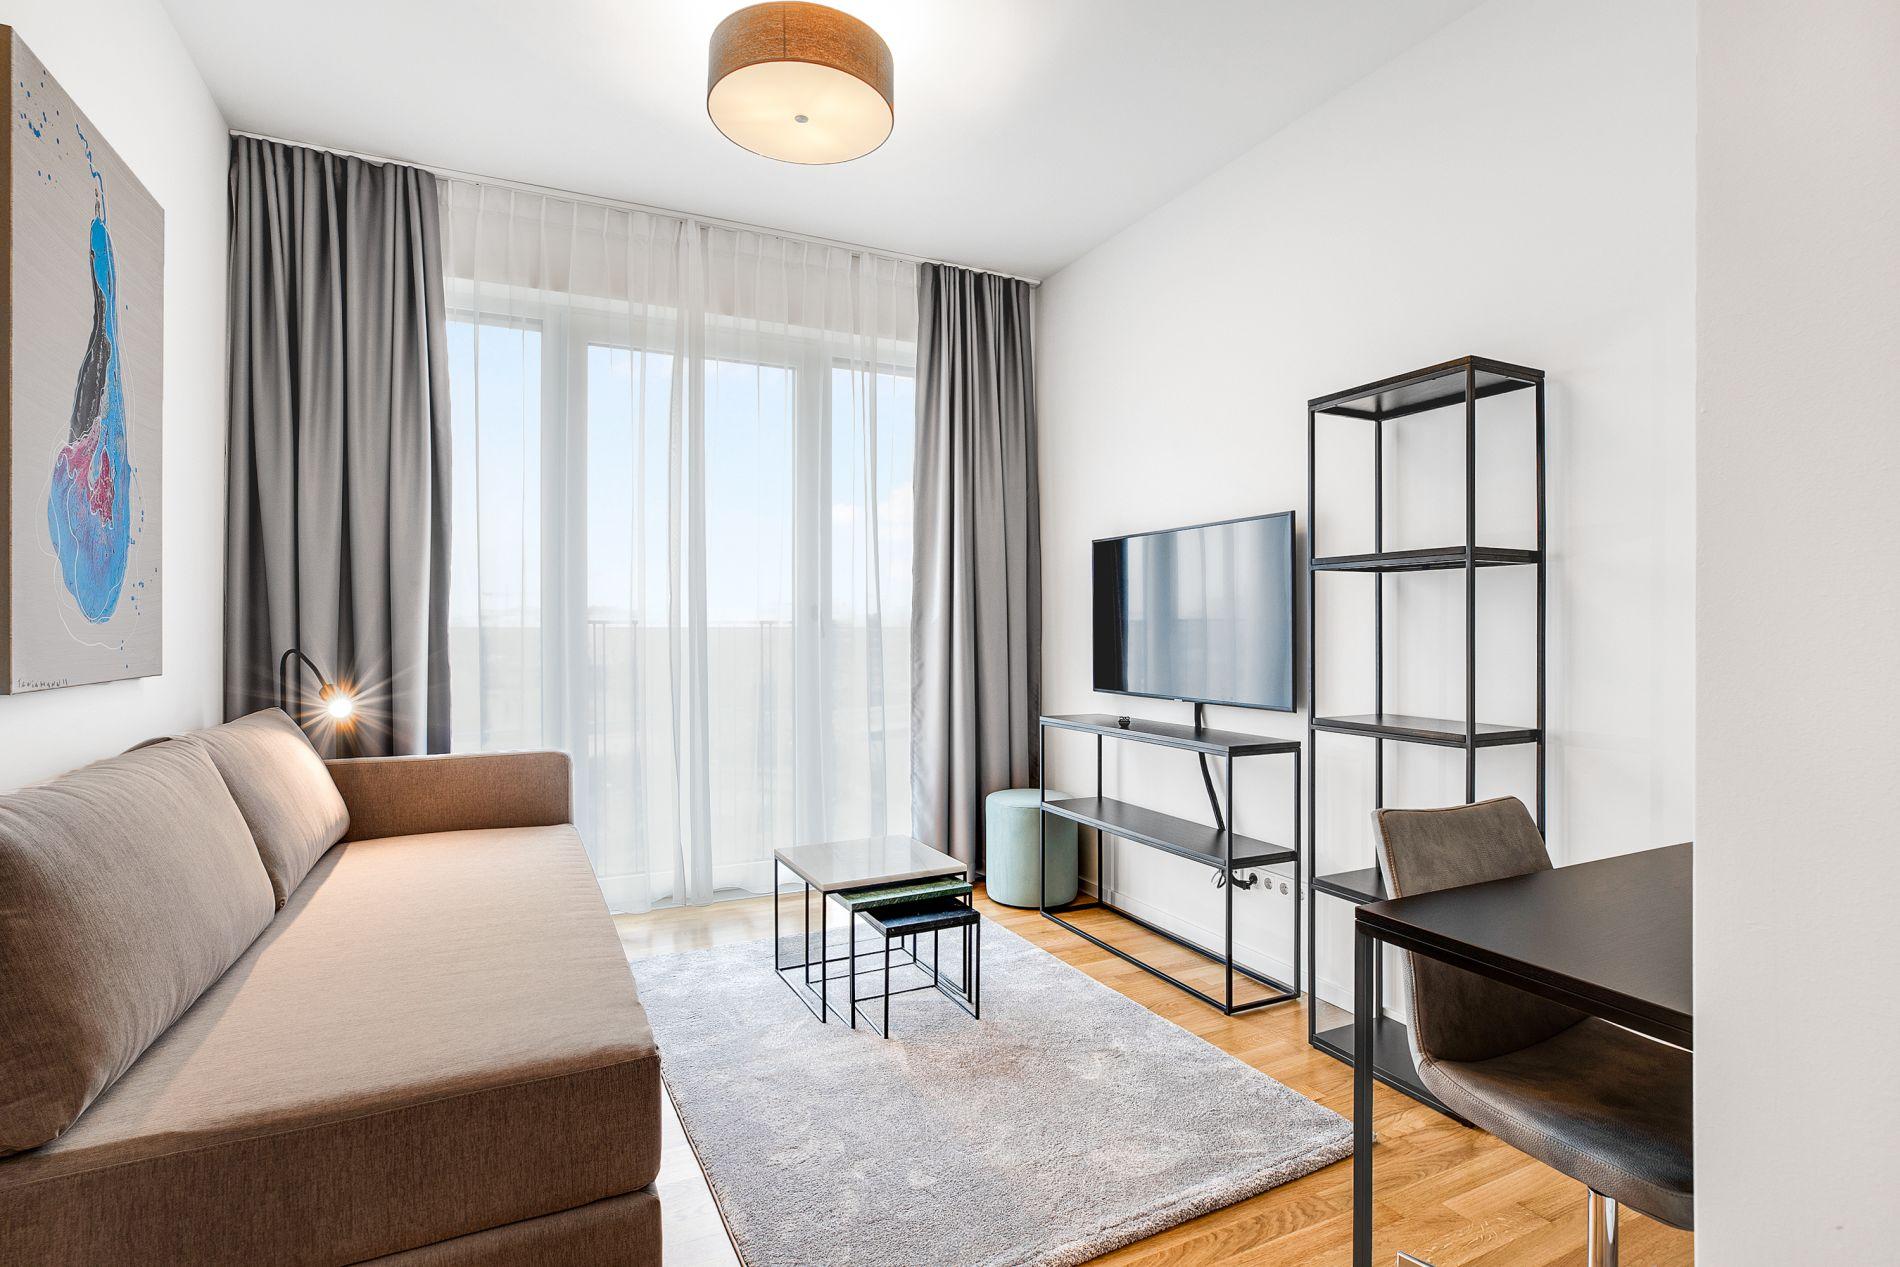 Studio apartment in the heart of Berlin